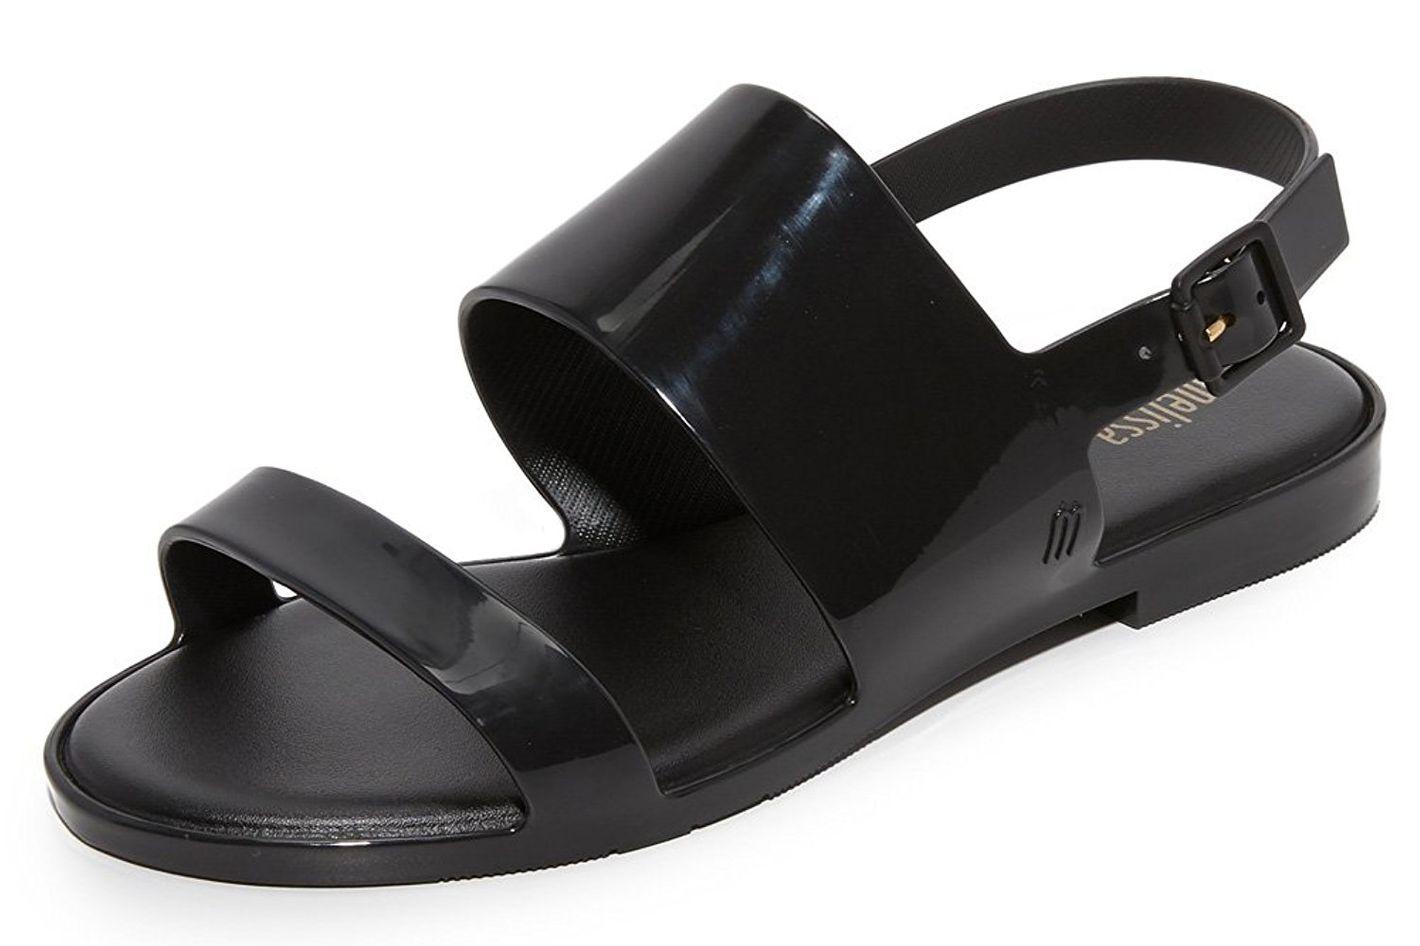 Melissa Women's Classy Sandals